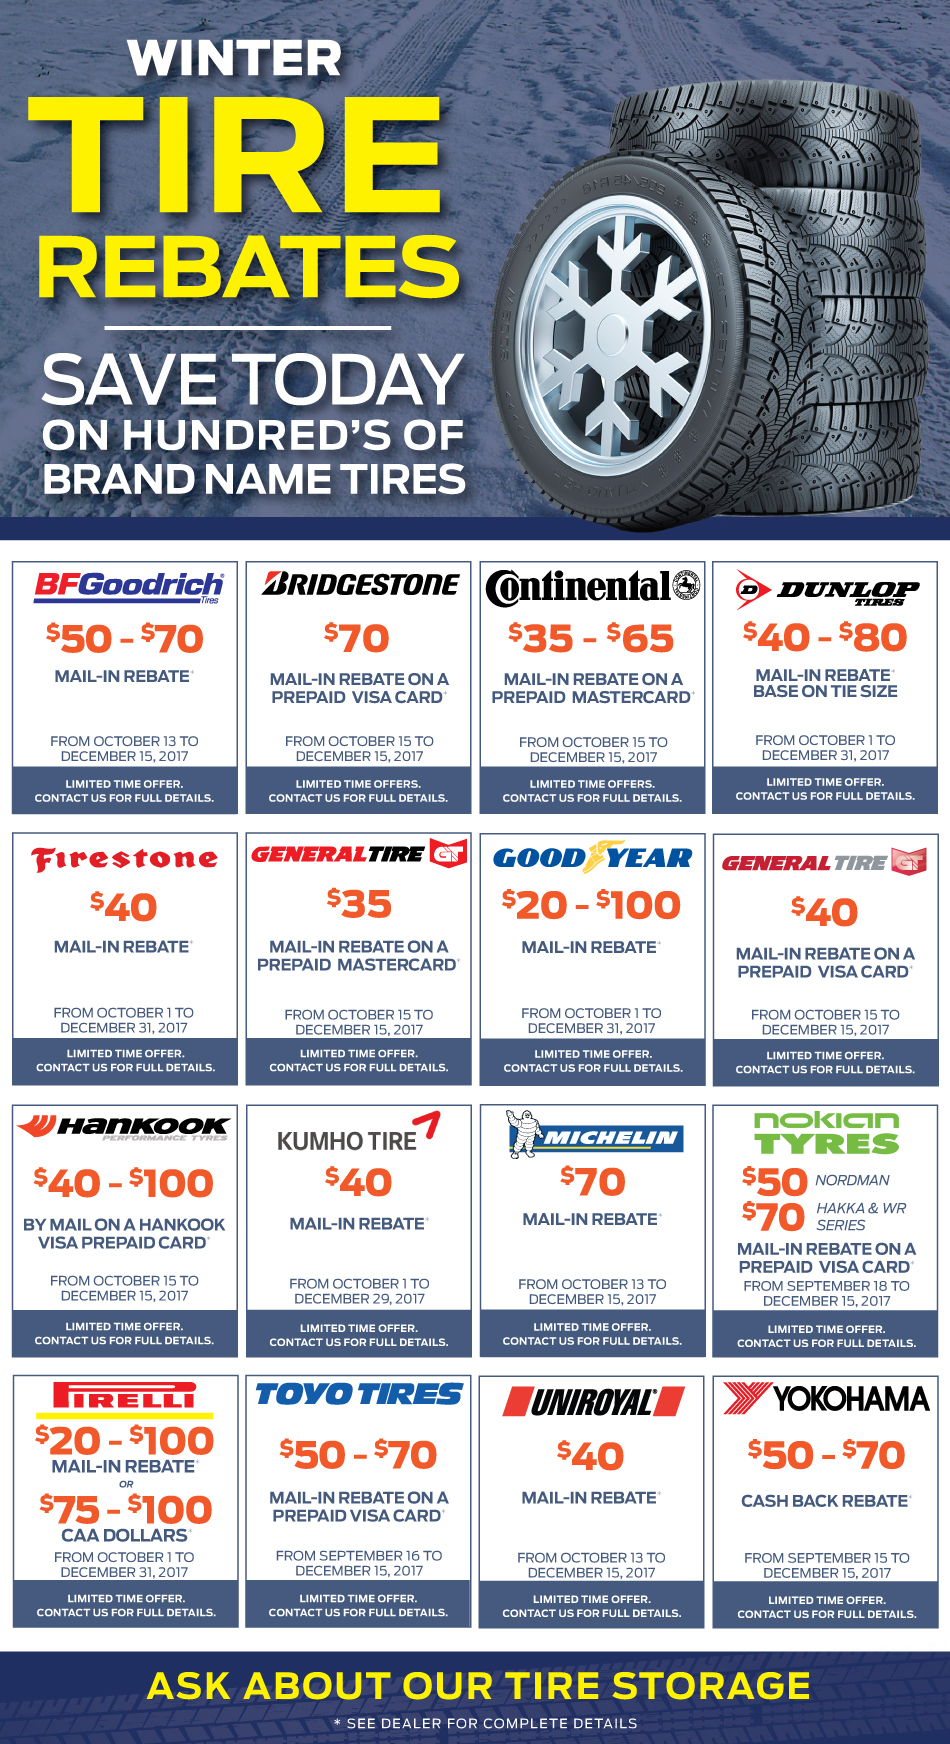 Manufacturer Winter Tire Rebates